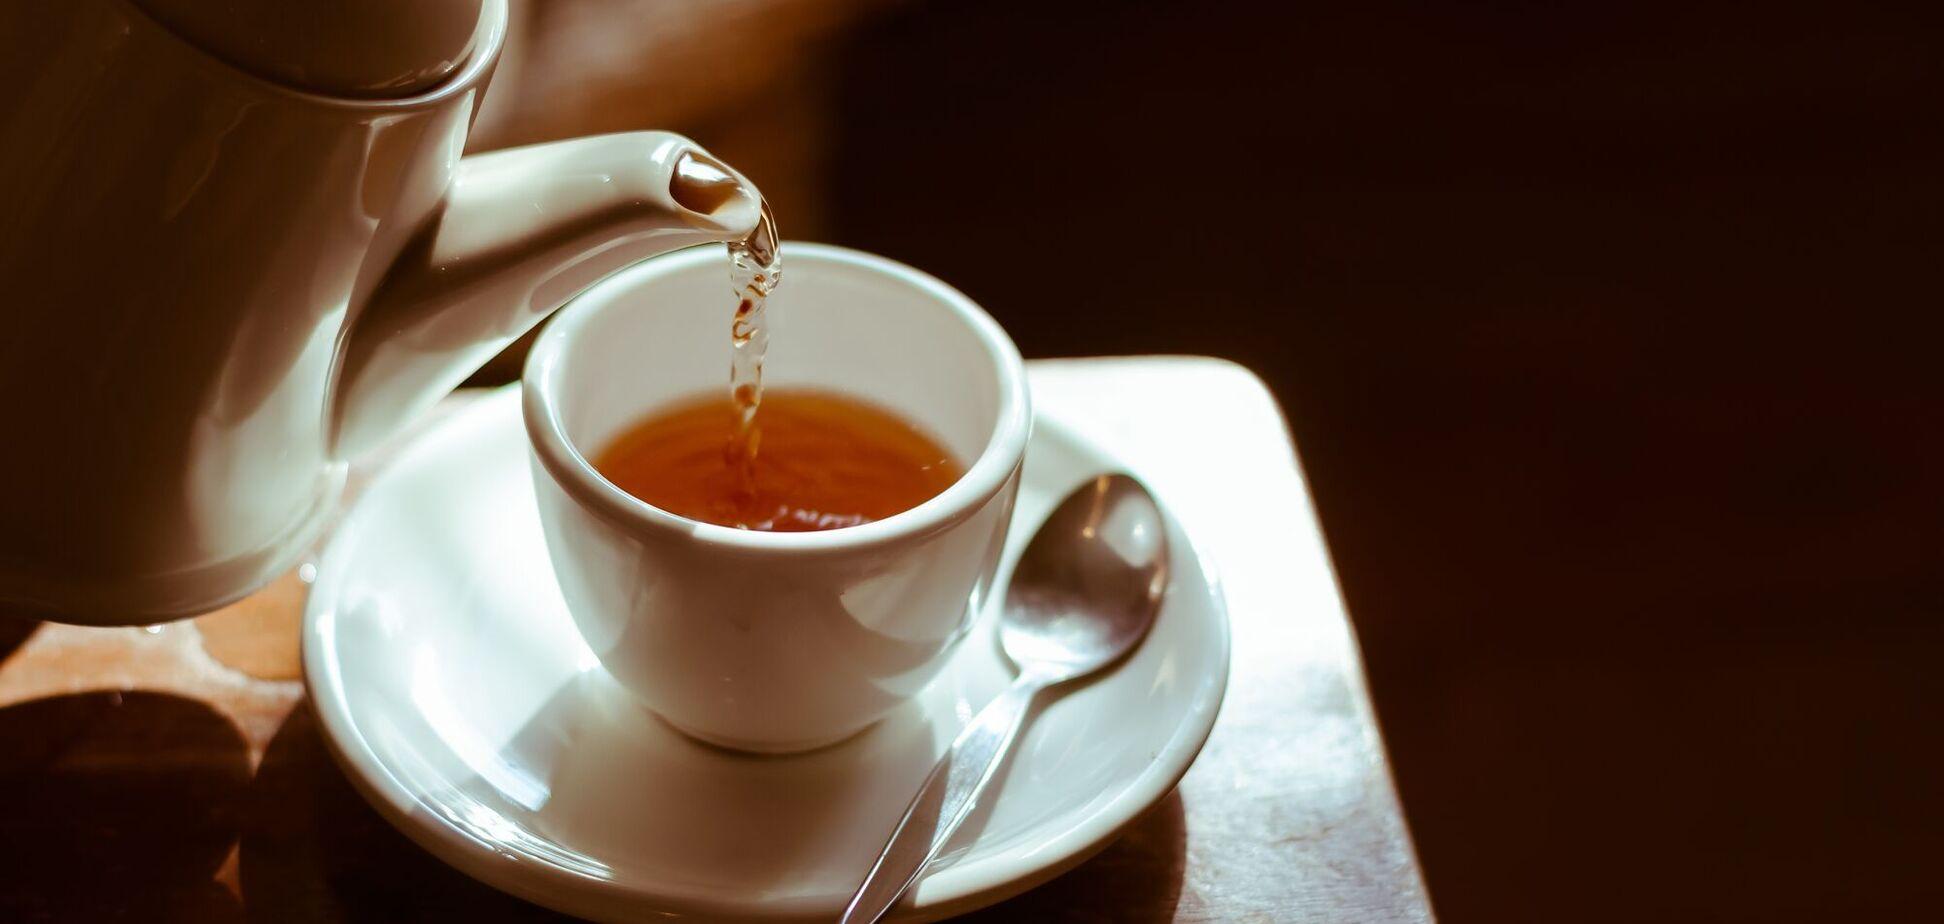 Сатиричну чайну компанію The End запустило агентство Niiiiice